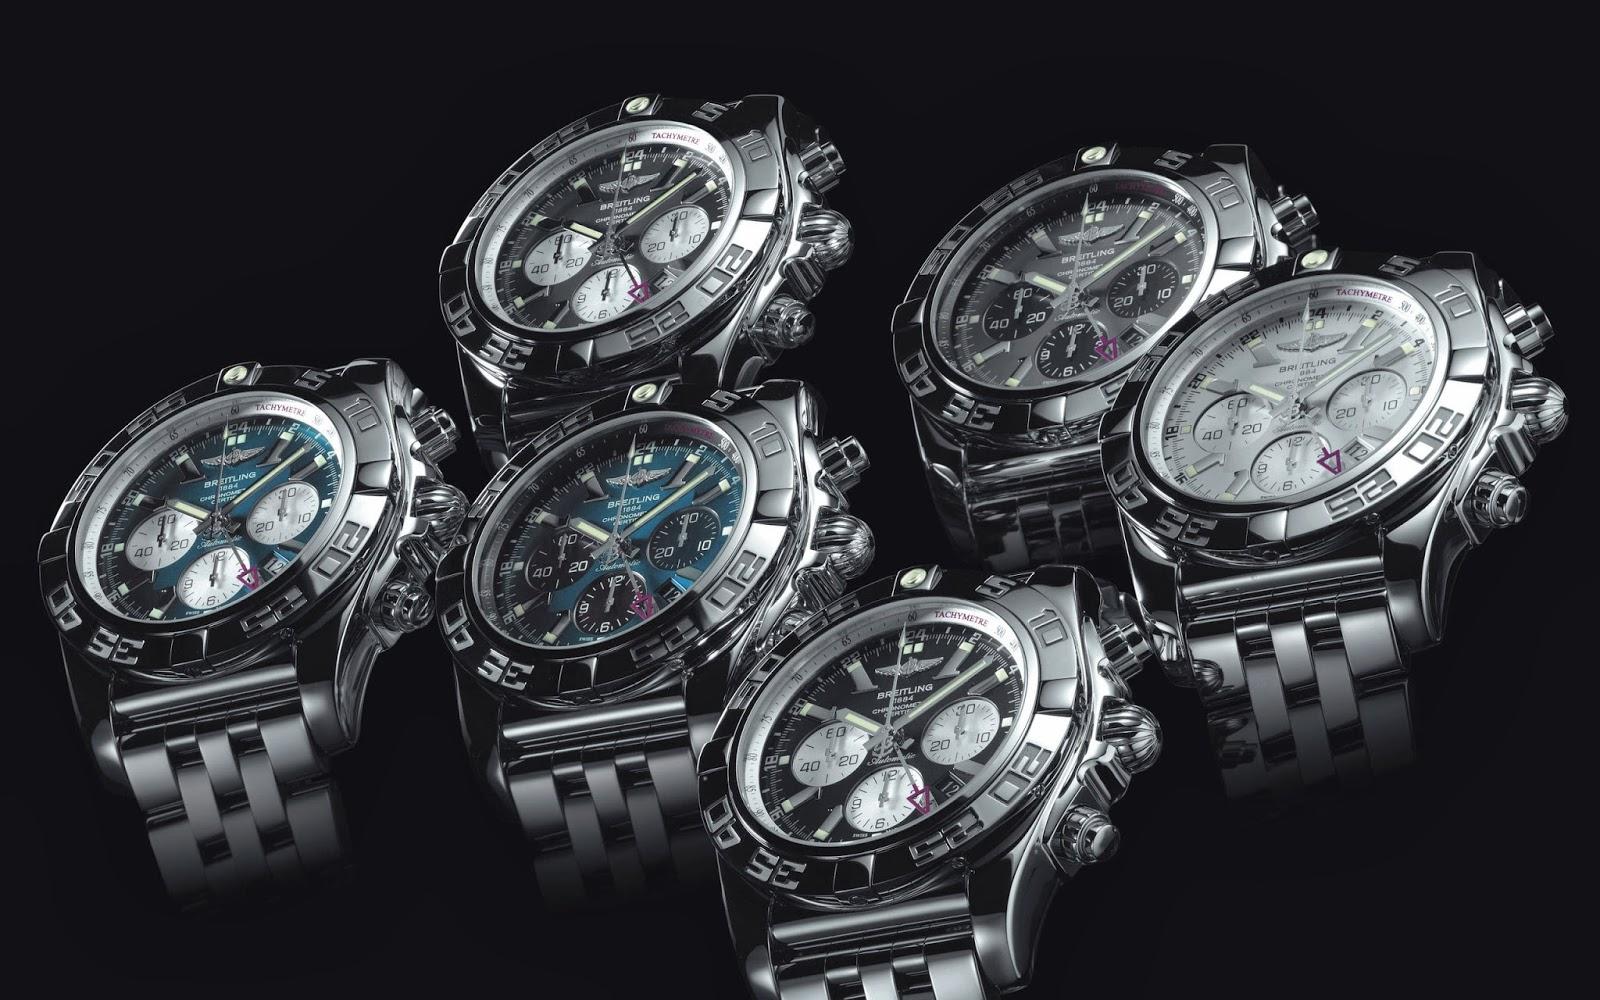 relojes full hd - photo #2